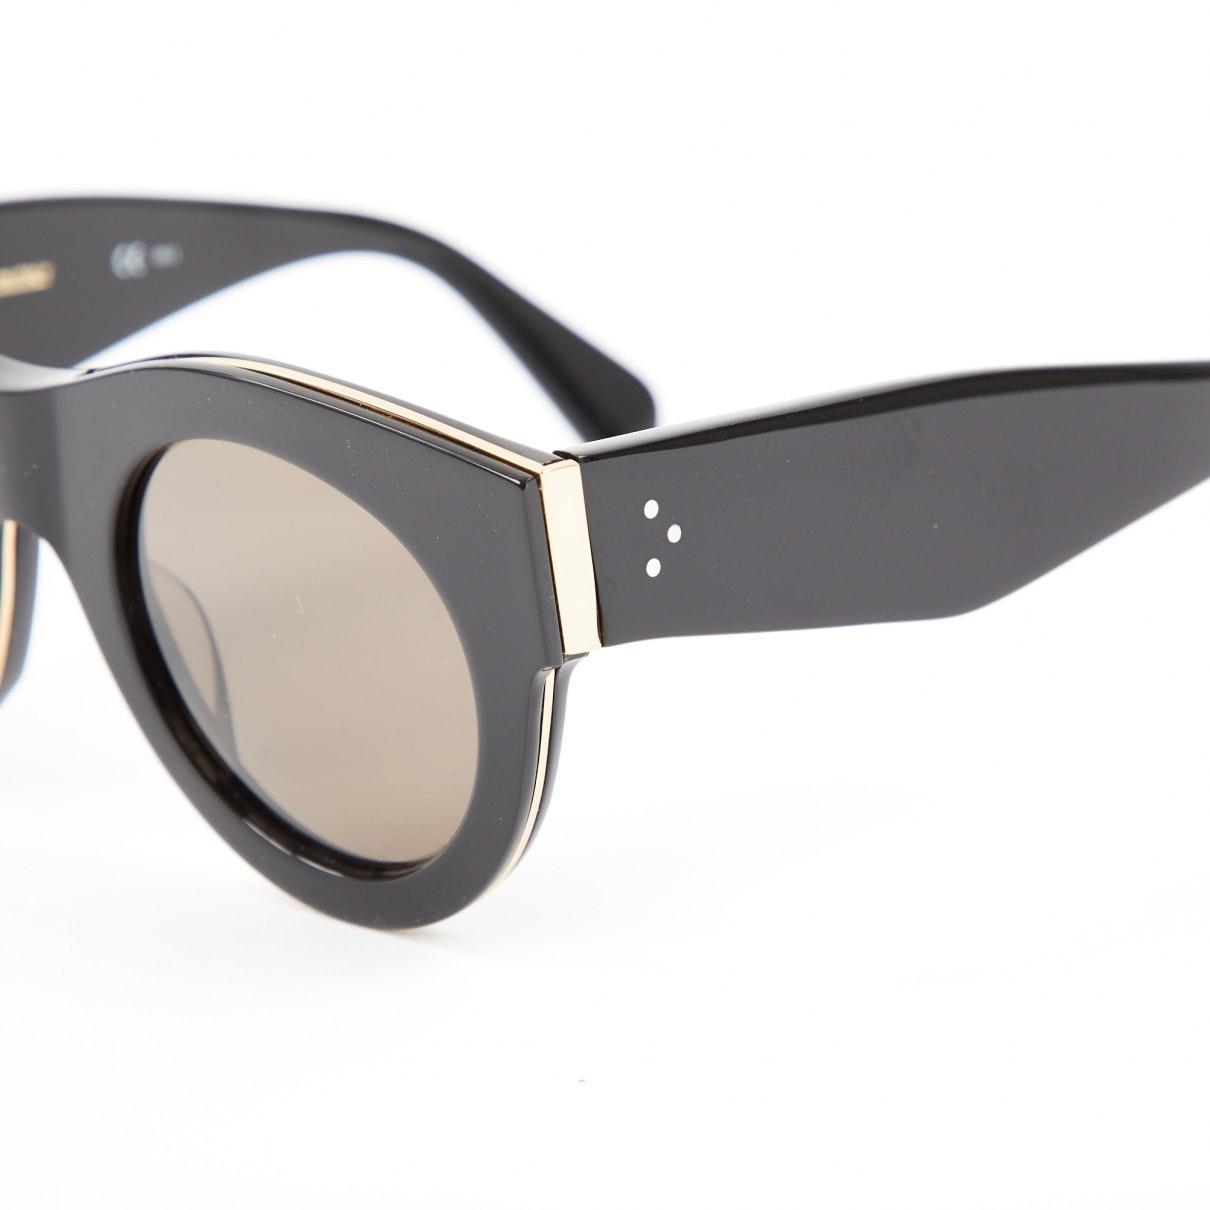 Celine Suede Black Plastic Sunglasses